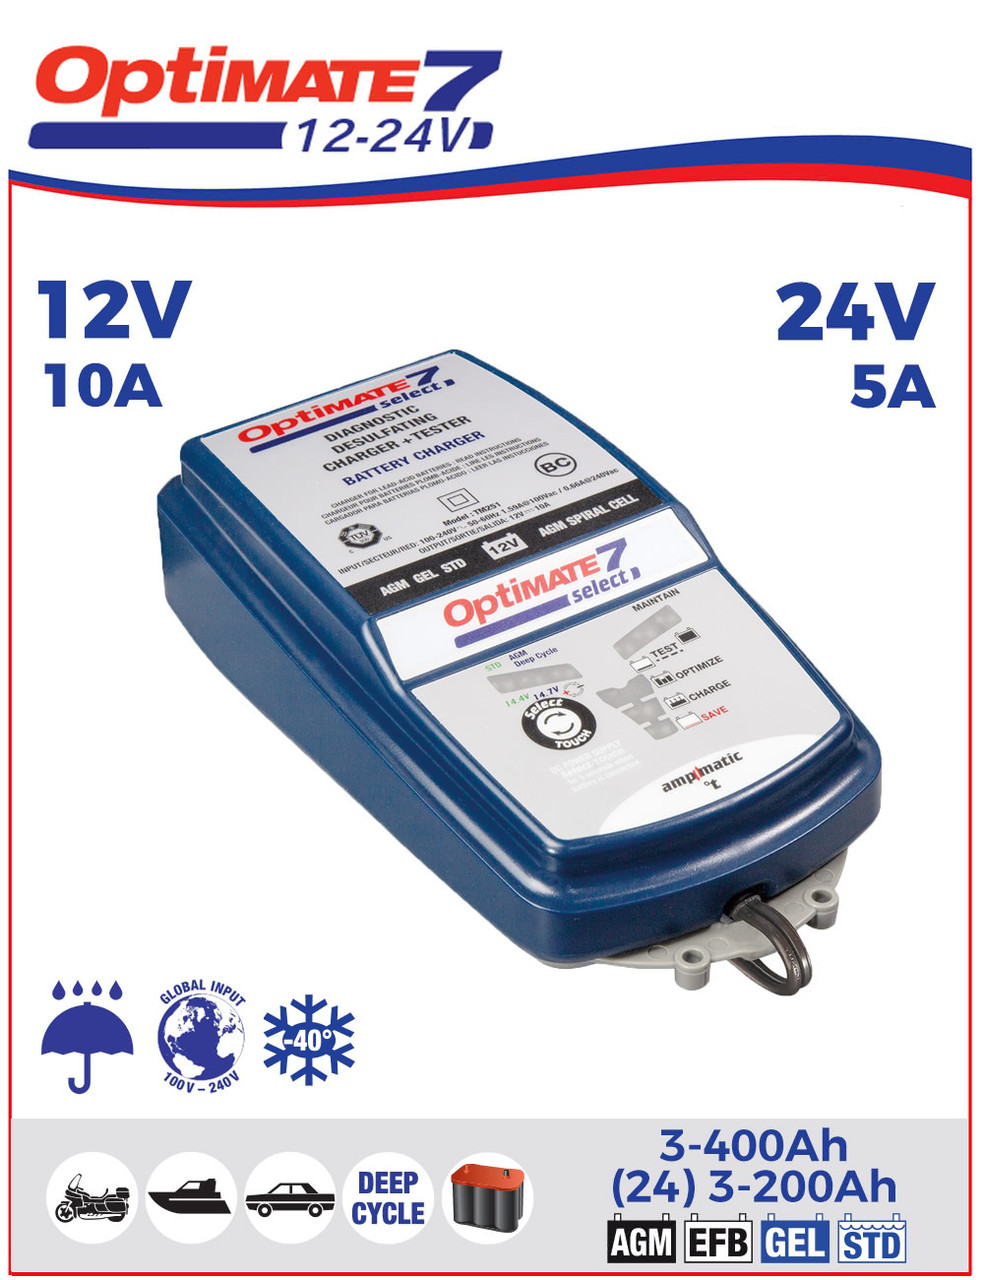 Зарядное устройство Optimate 7 12/24V TM260 (1-10А-12V, 5A-24V)